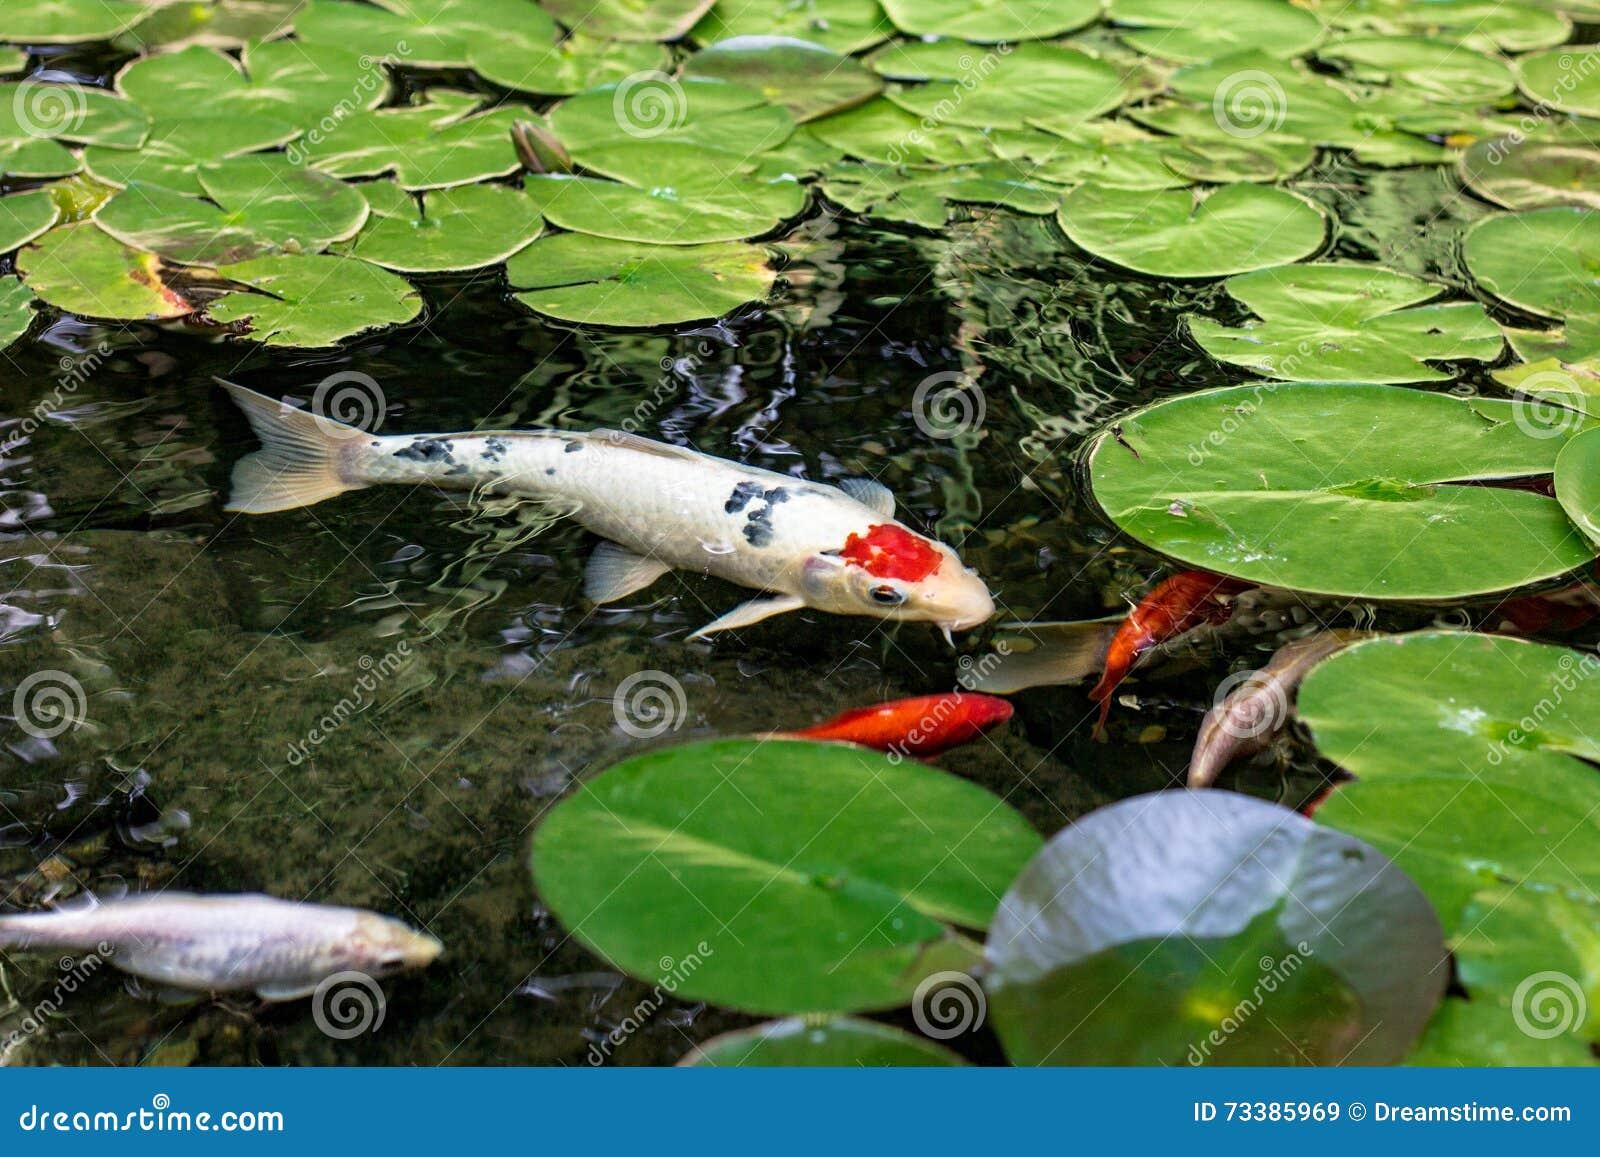 Koi pond stock photo image 73385969 for Koi fish pond lotus